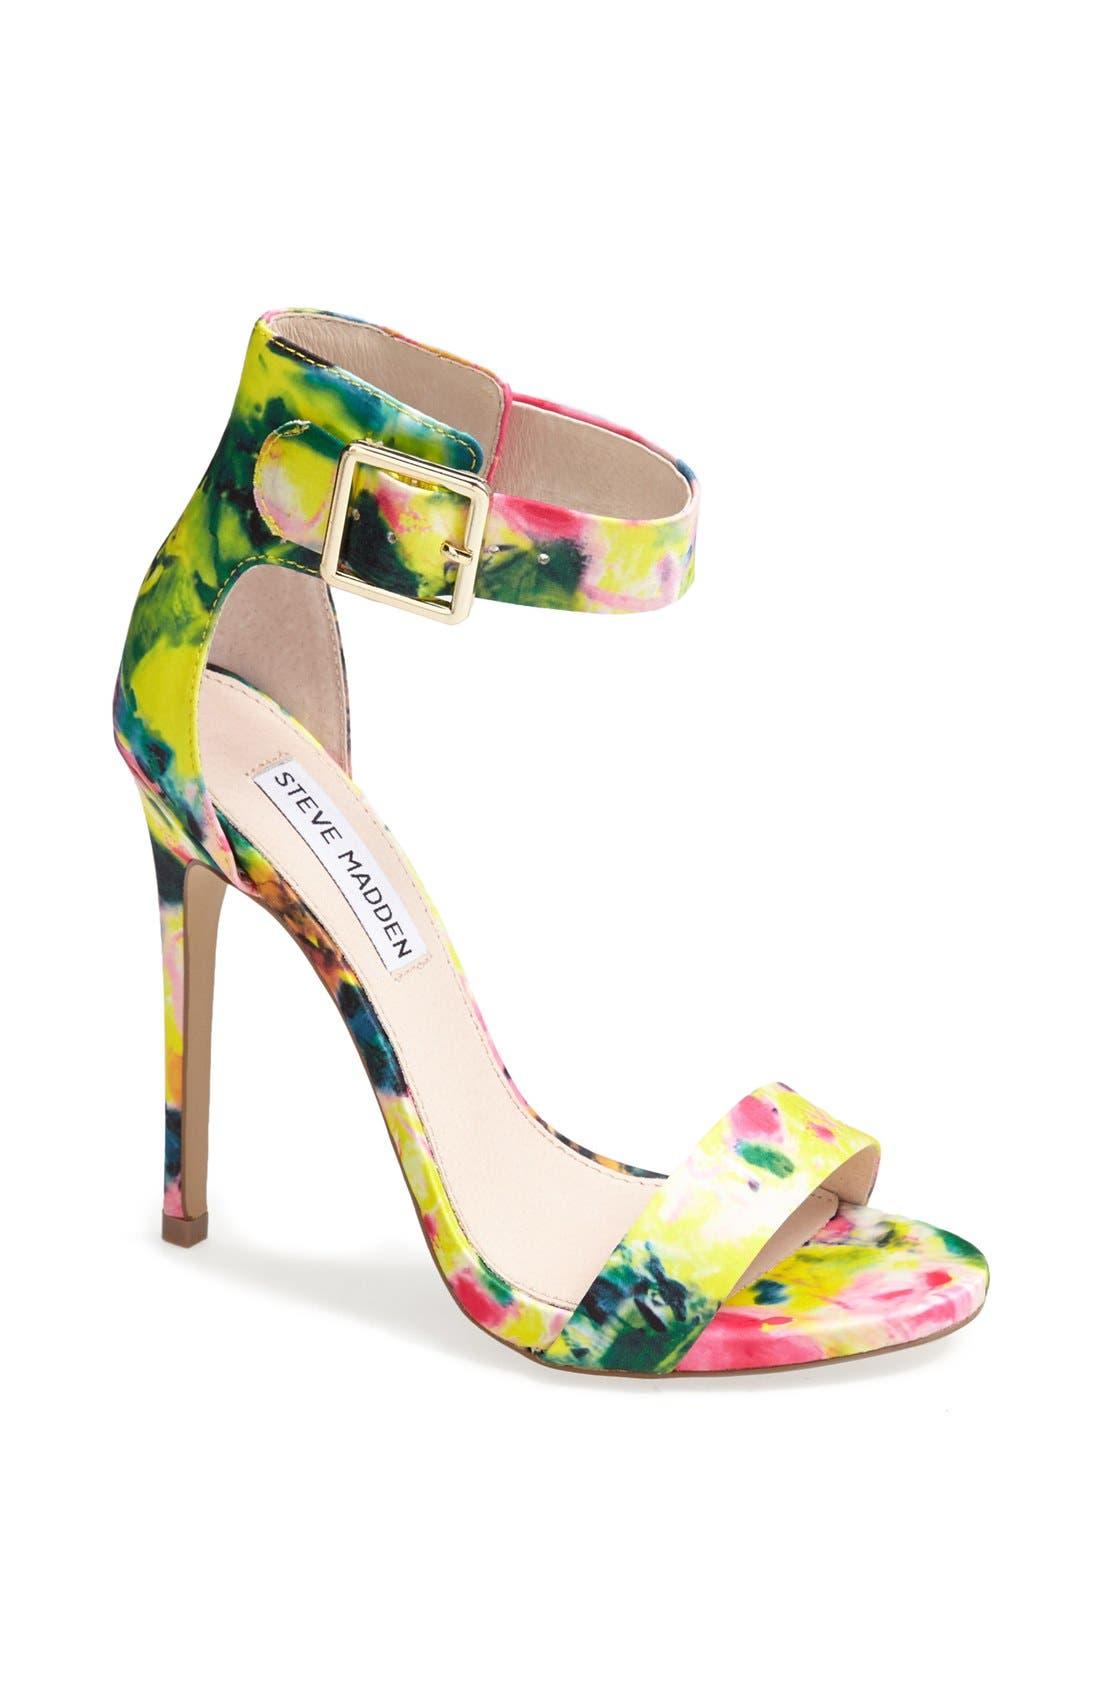 Alternate Image 1 Selected - Steve Madden 'Marlenee' Floral Print Sandal